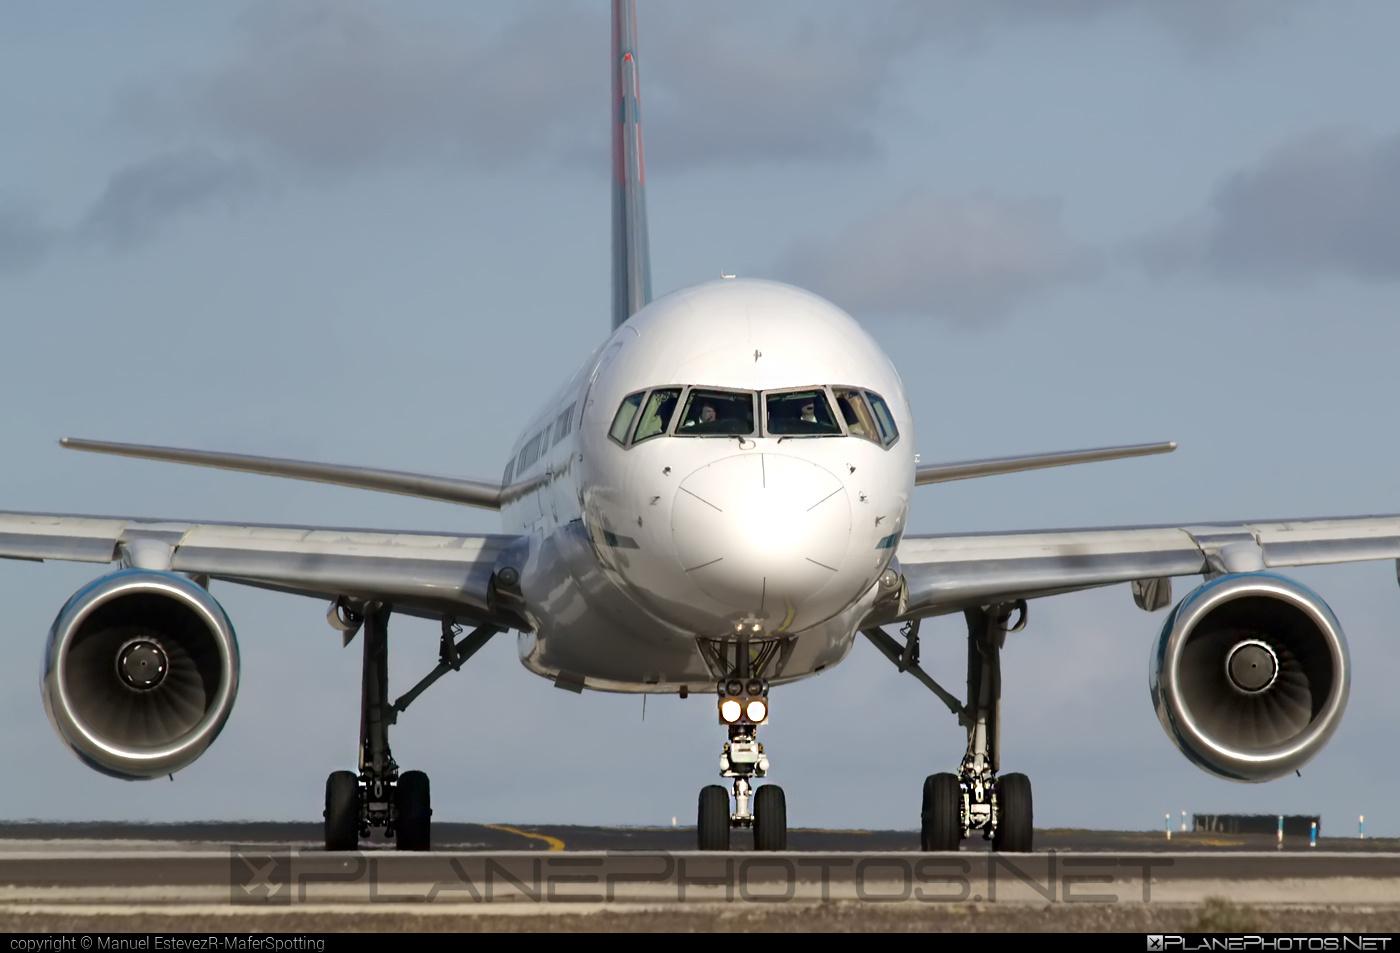 Boeing 757-200 - G-OOBJ operated by First Choice Airways #b757 #boeing #boeing757